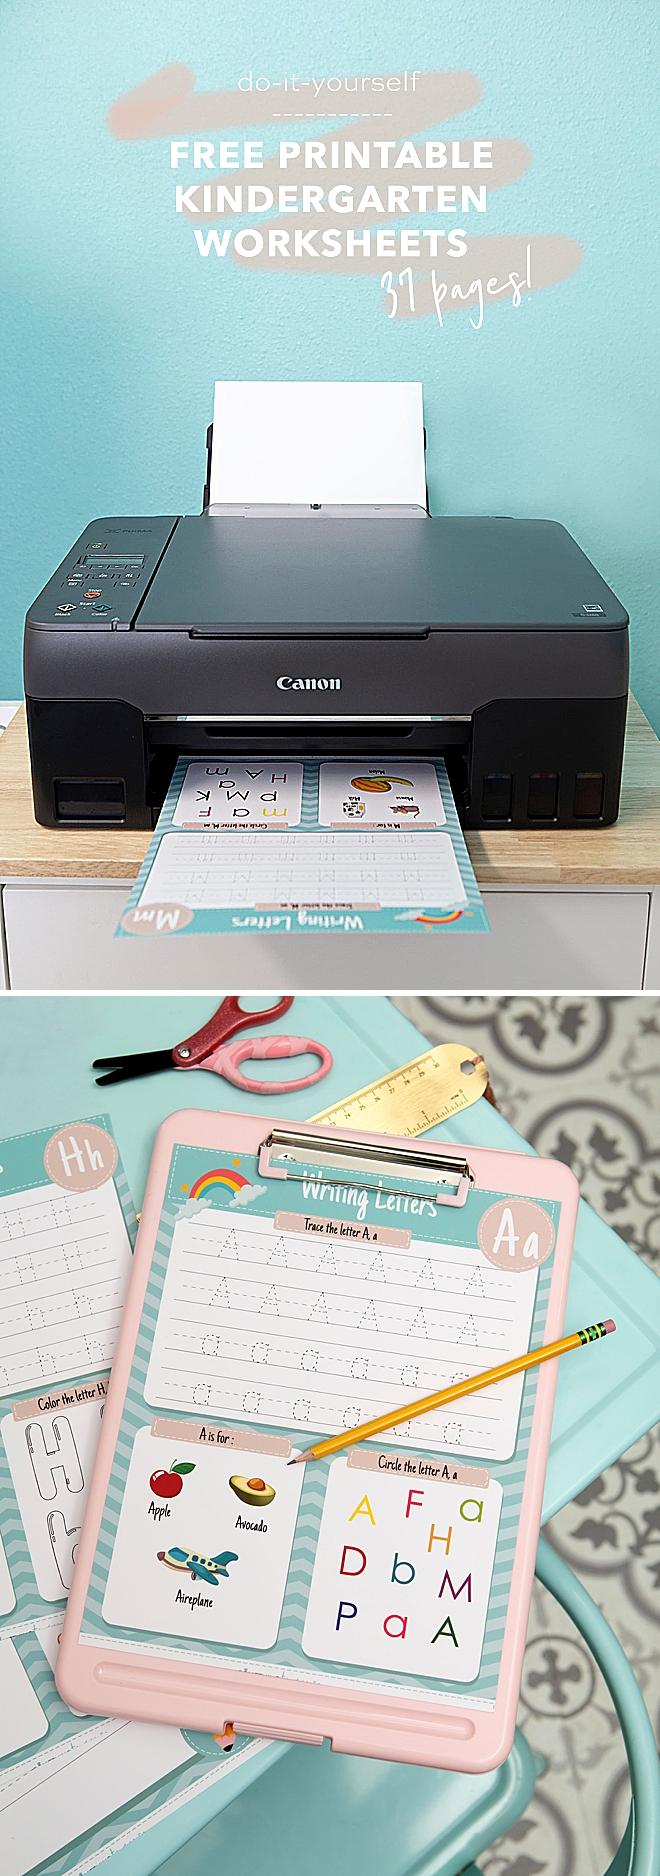 Free, 37 full color printable kindergarten worksheets!